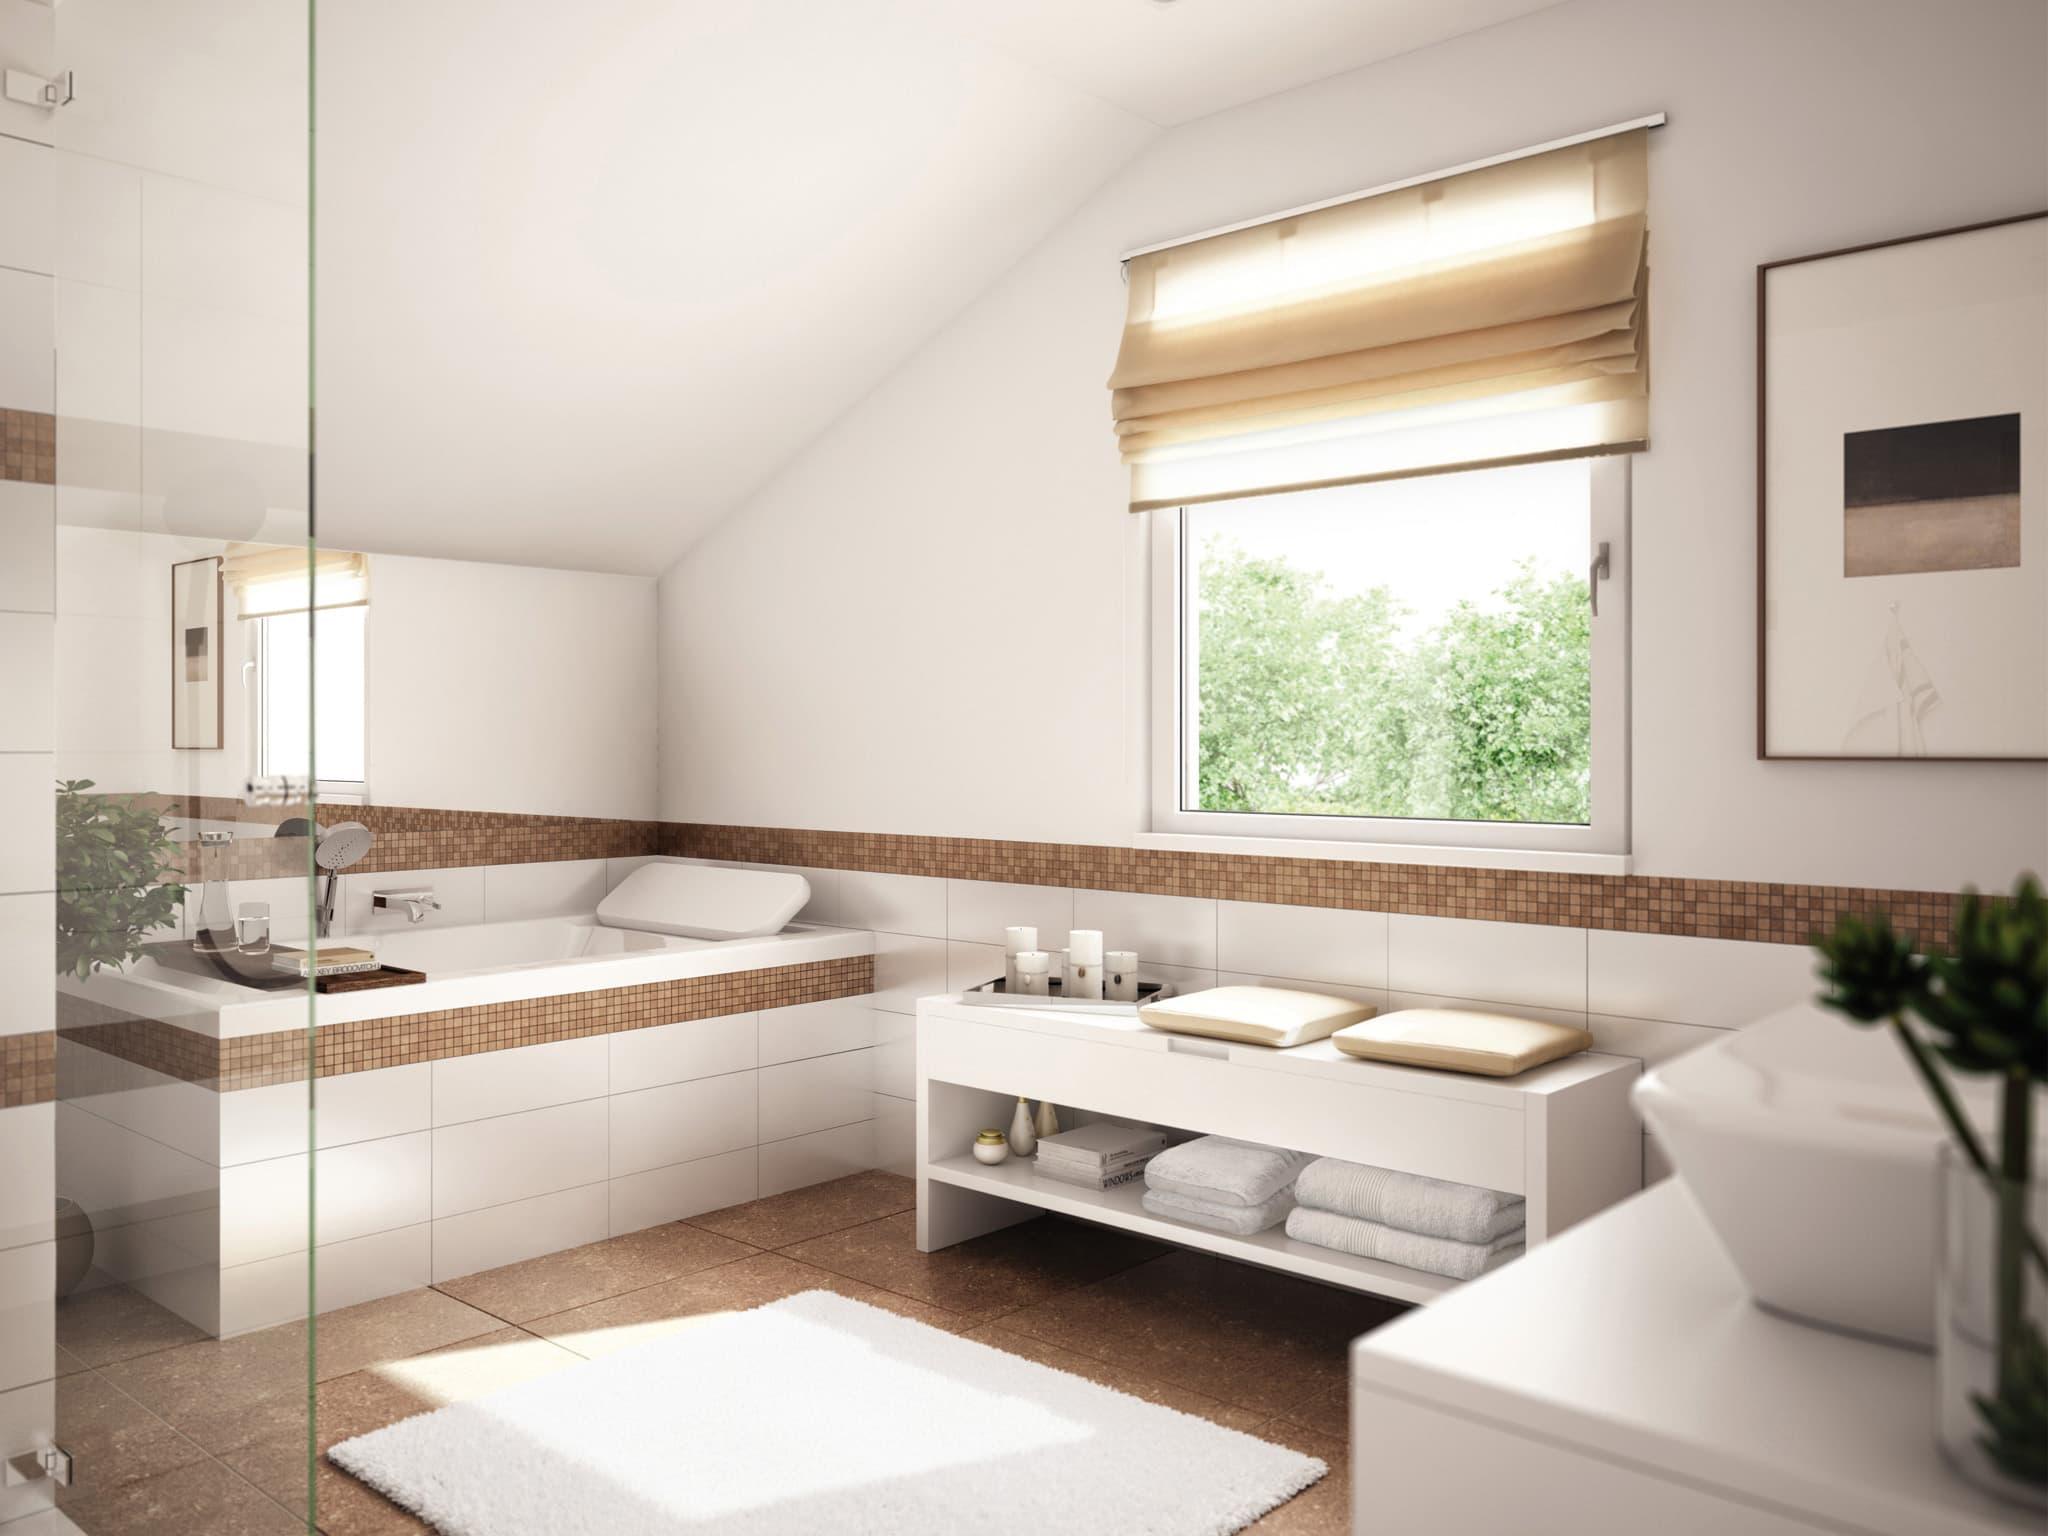 Badezimmer Ideen - Einfamilienhaus Inneneinrichtung Living Haus SUNSHINE 151 V3 - HausbauDirekt.de